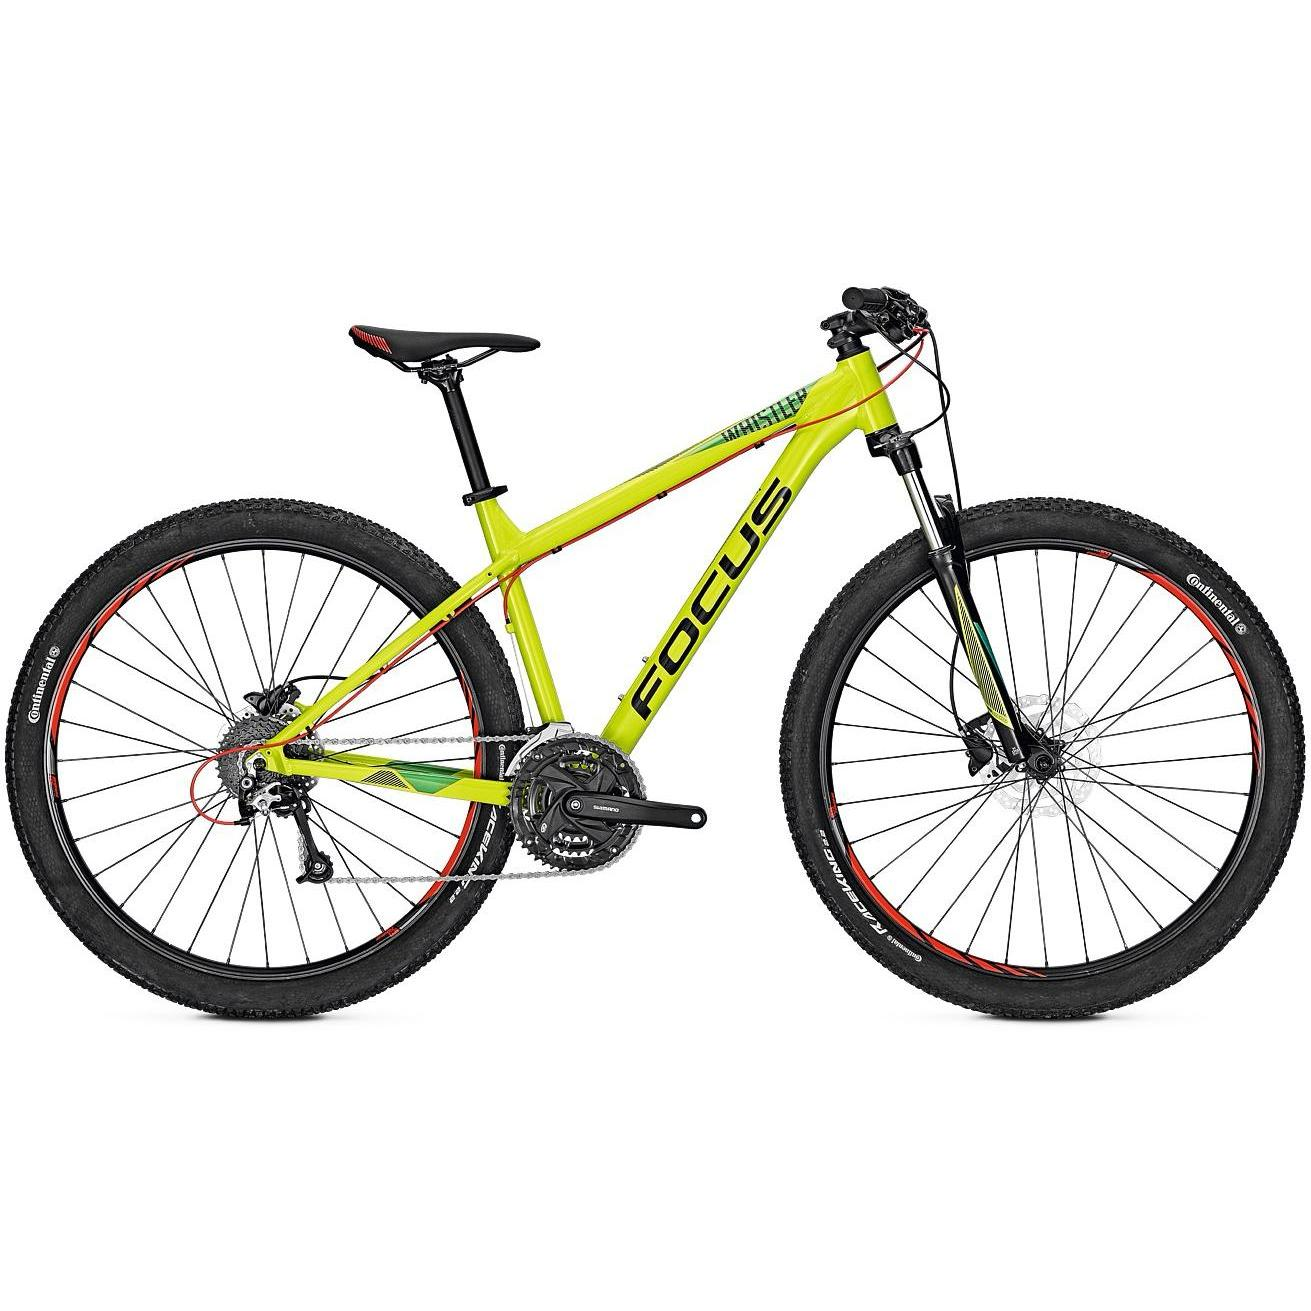 Велосипед Focus Whistler Evo 29 2018 Limegreen